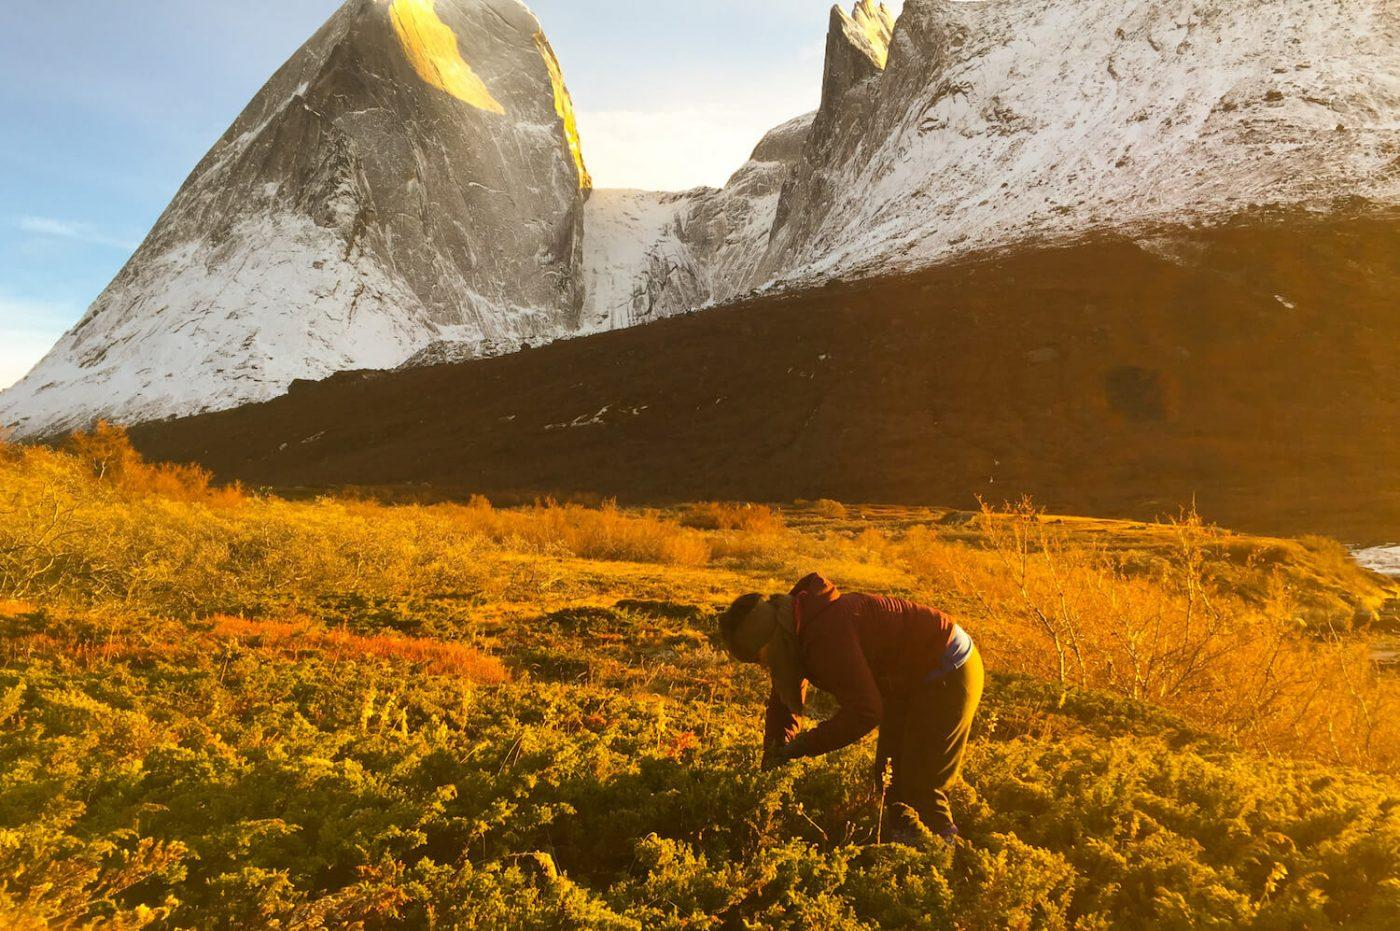 Hiker exploring the nature near Tasermiut Fjord. Visit Greenland